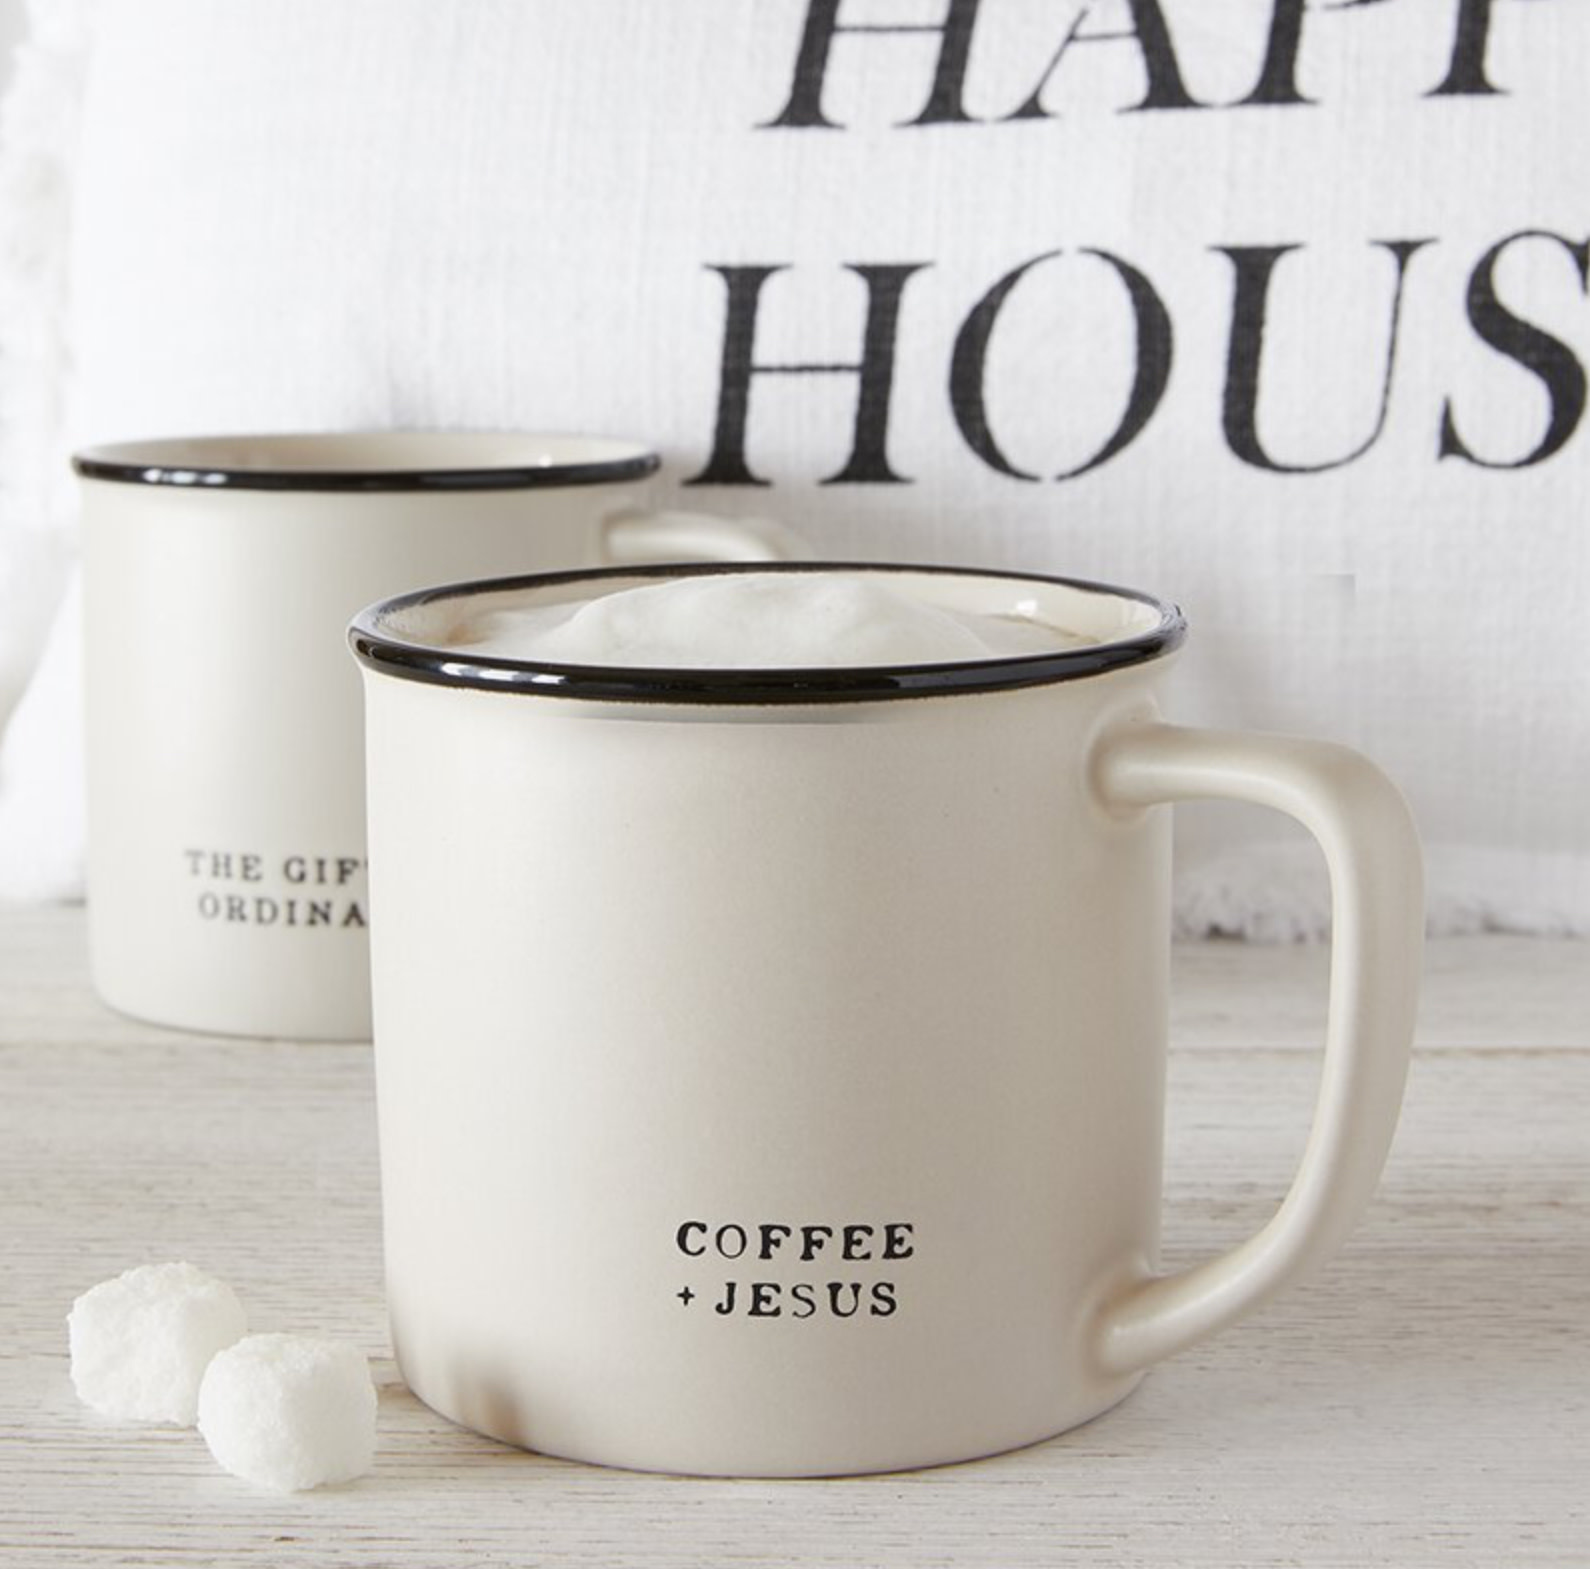 Coffee + Jesus Mug